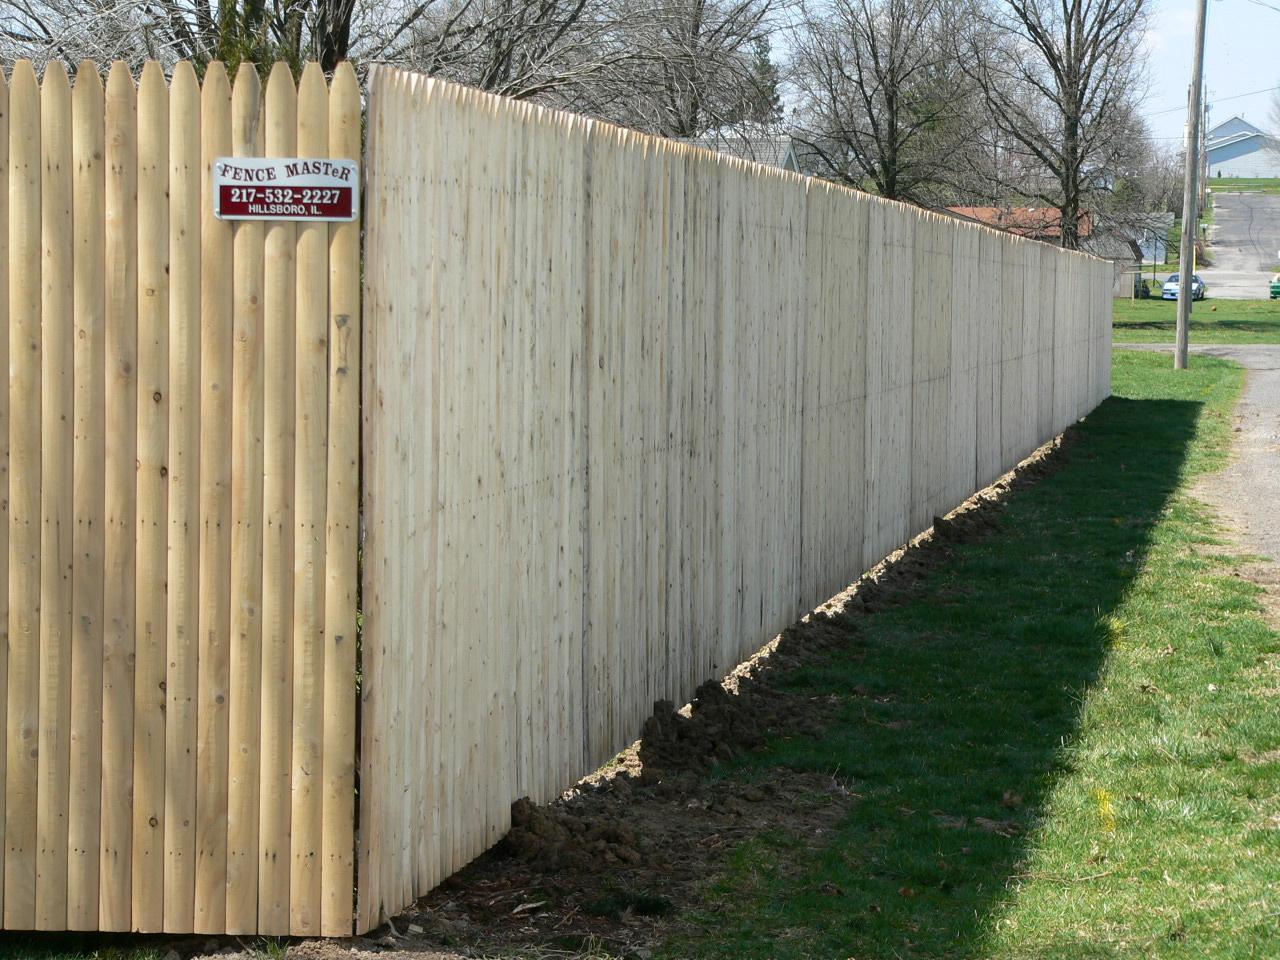 https://0201.nccdn.net/1_2/000/000/0e6/5c0/Fence-Master-083-1280x960.jpg